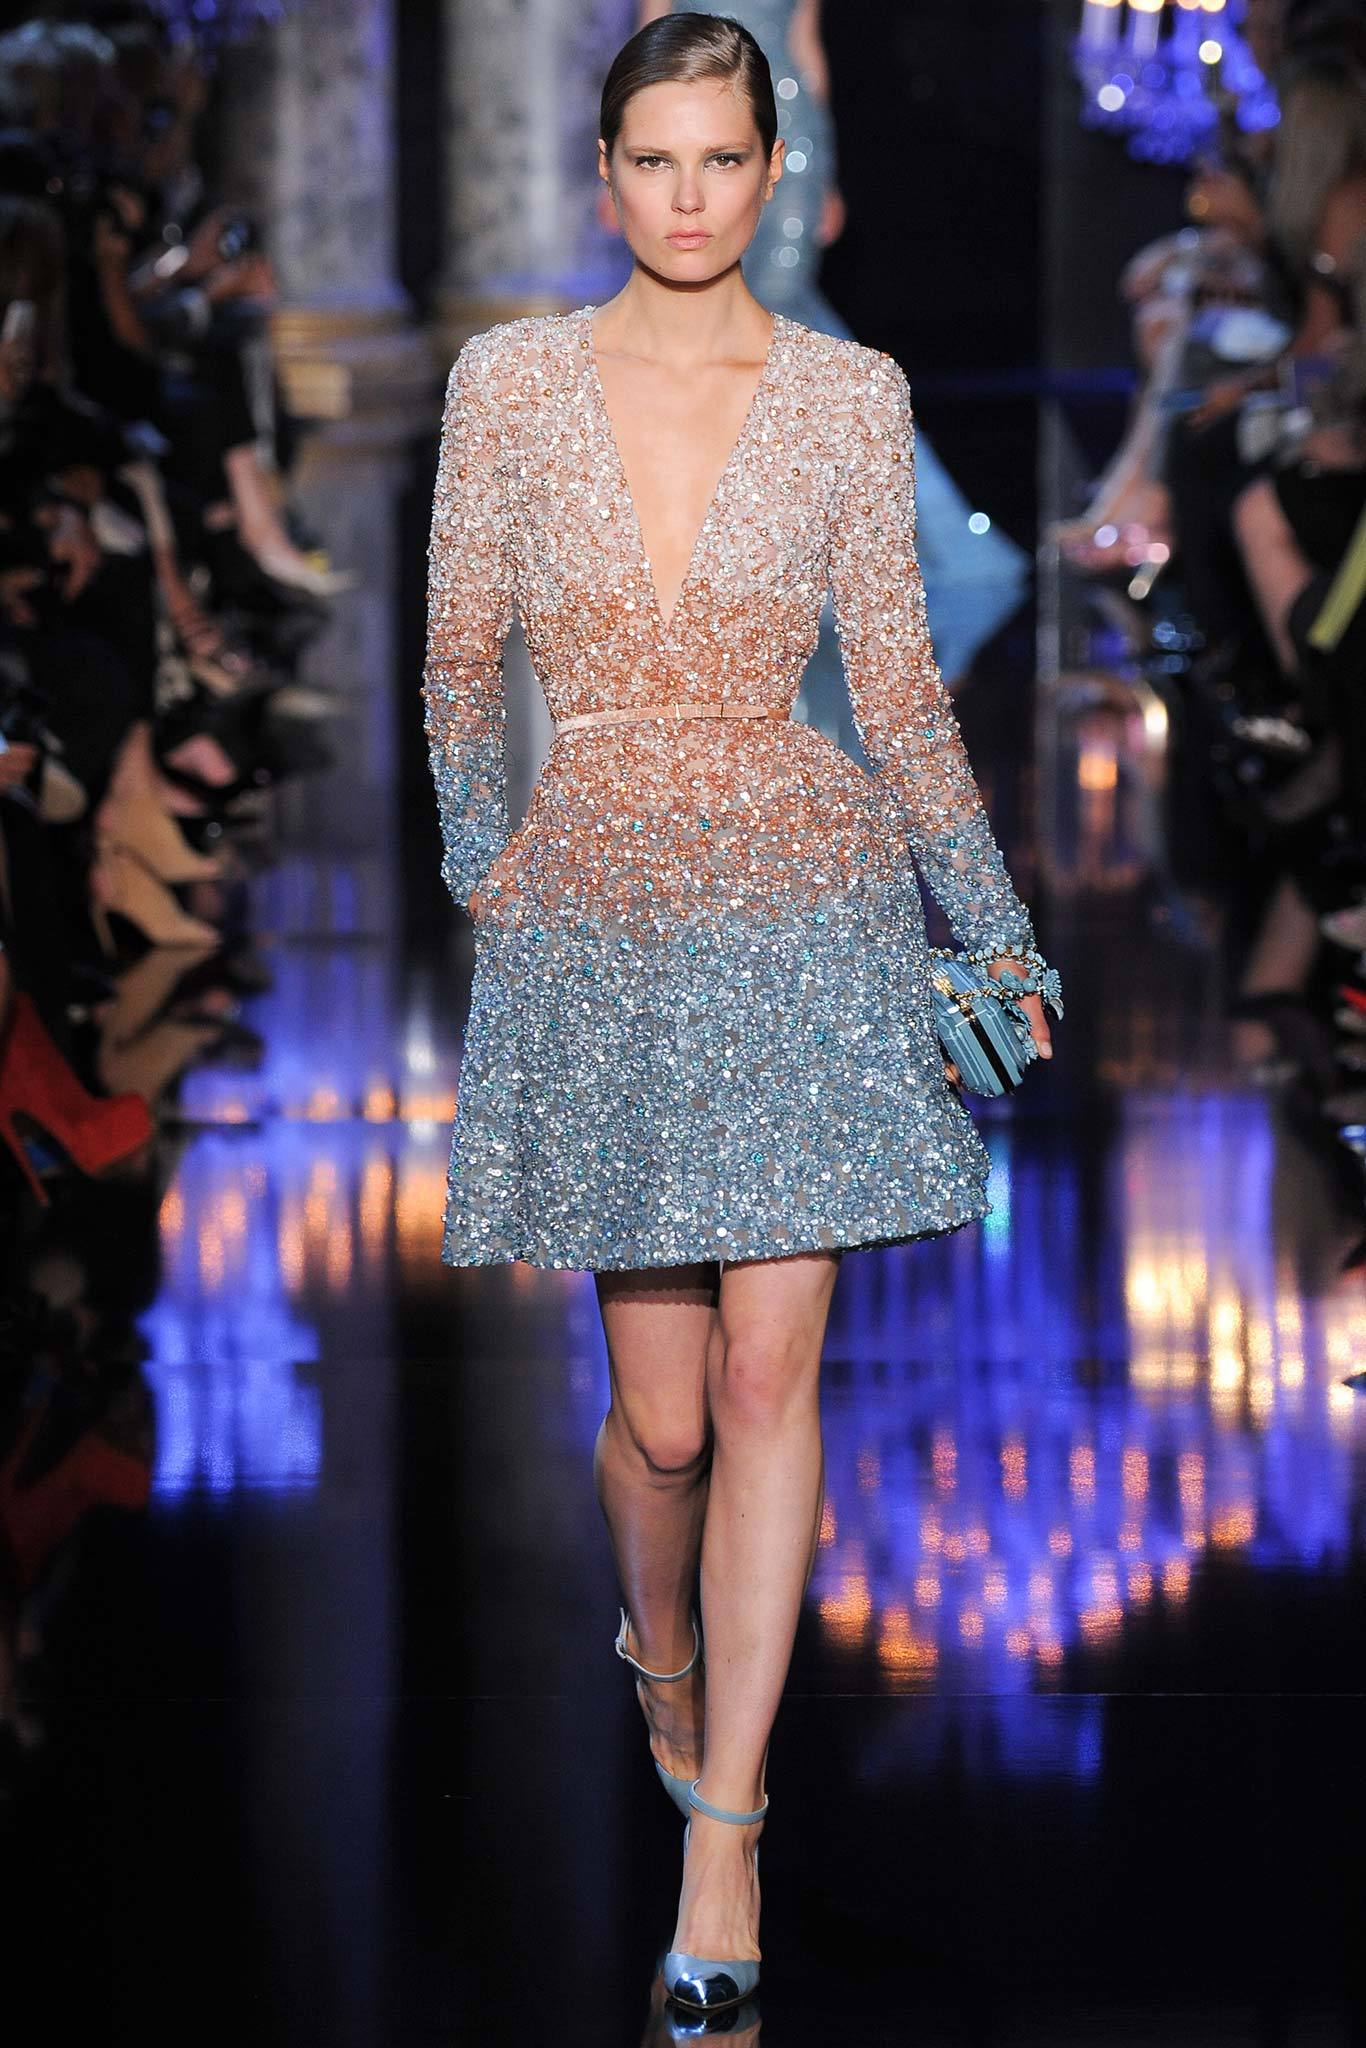 Elie-Saab-Couture-Fall2014-01.JPG